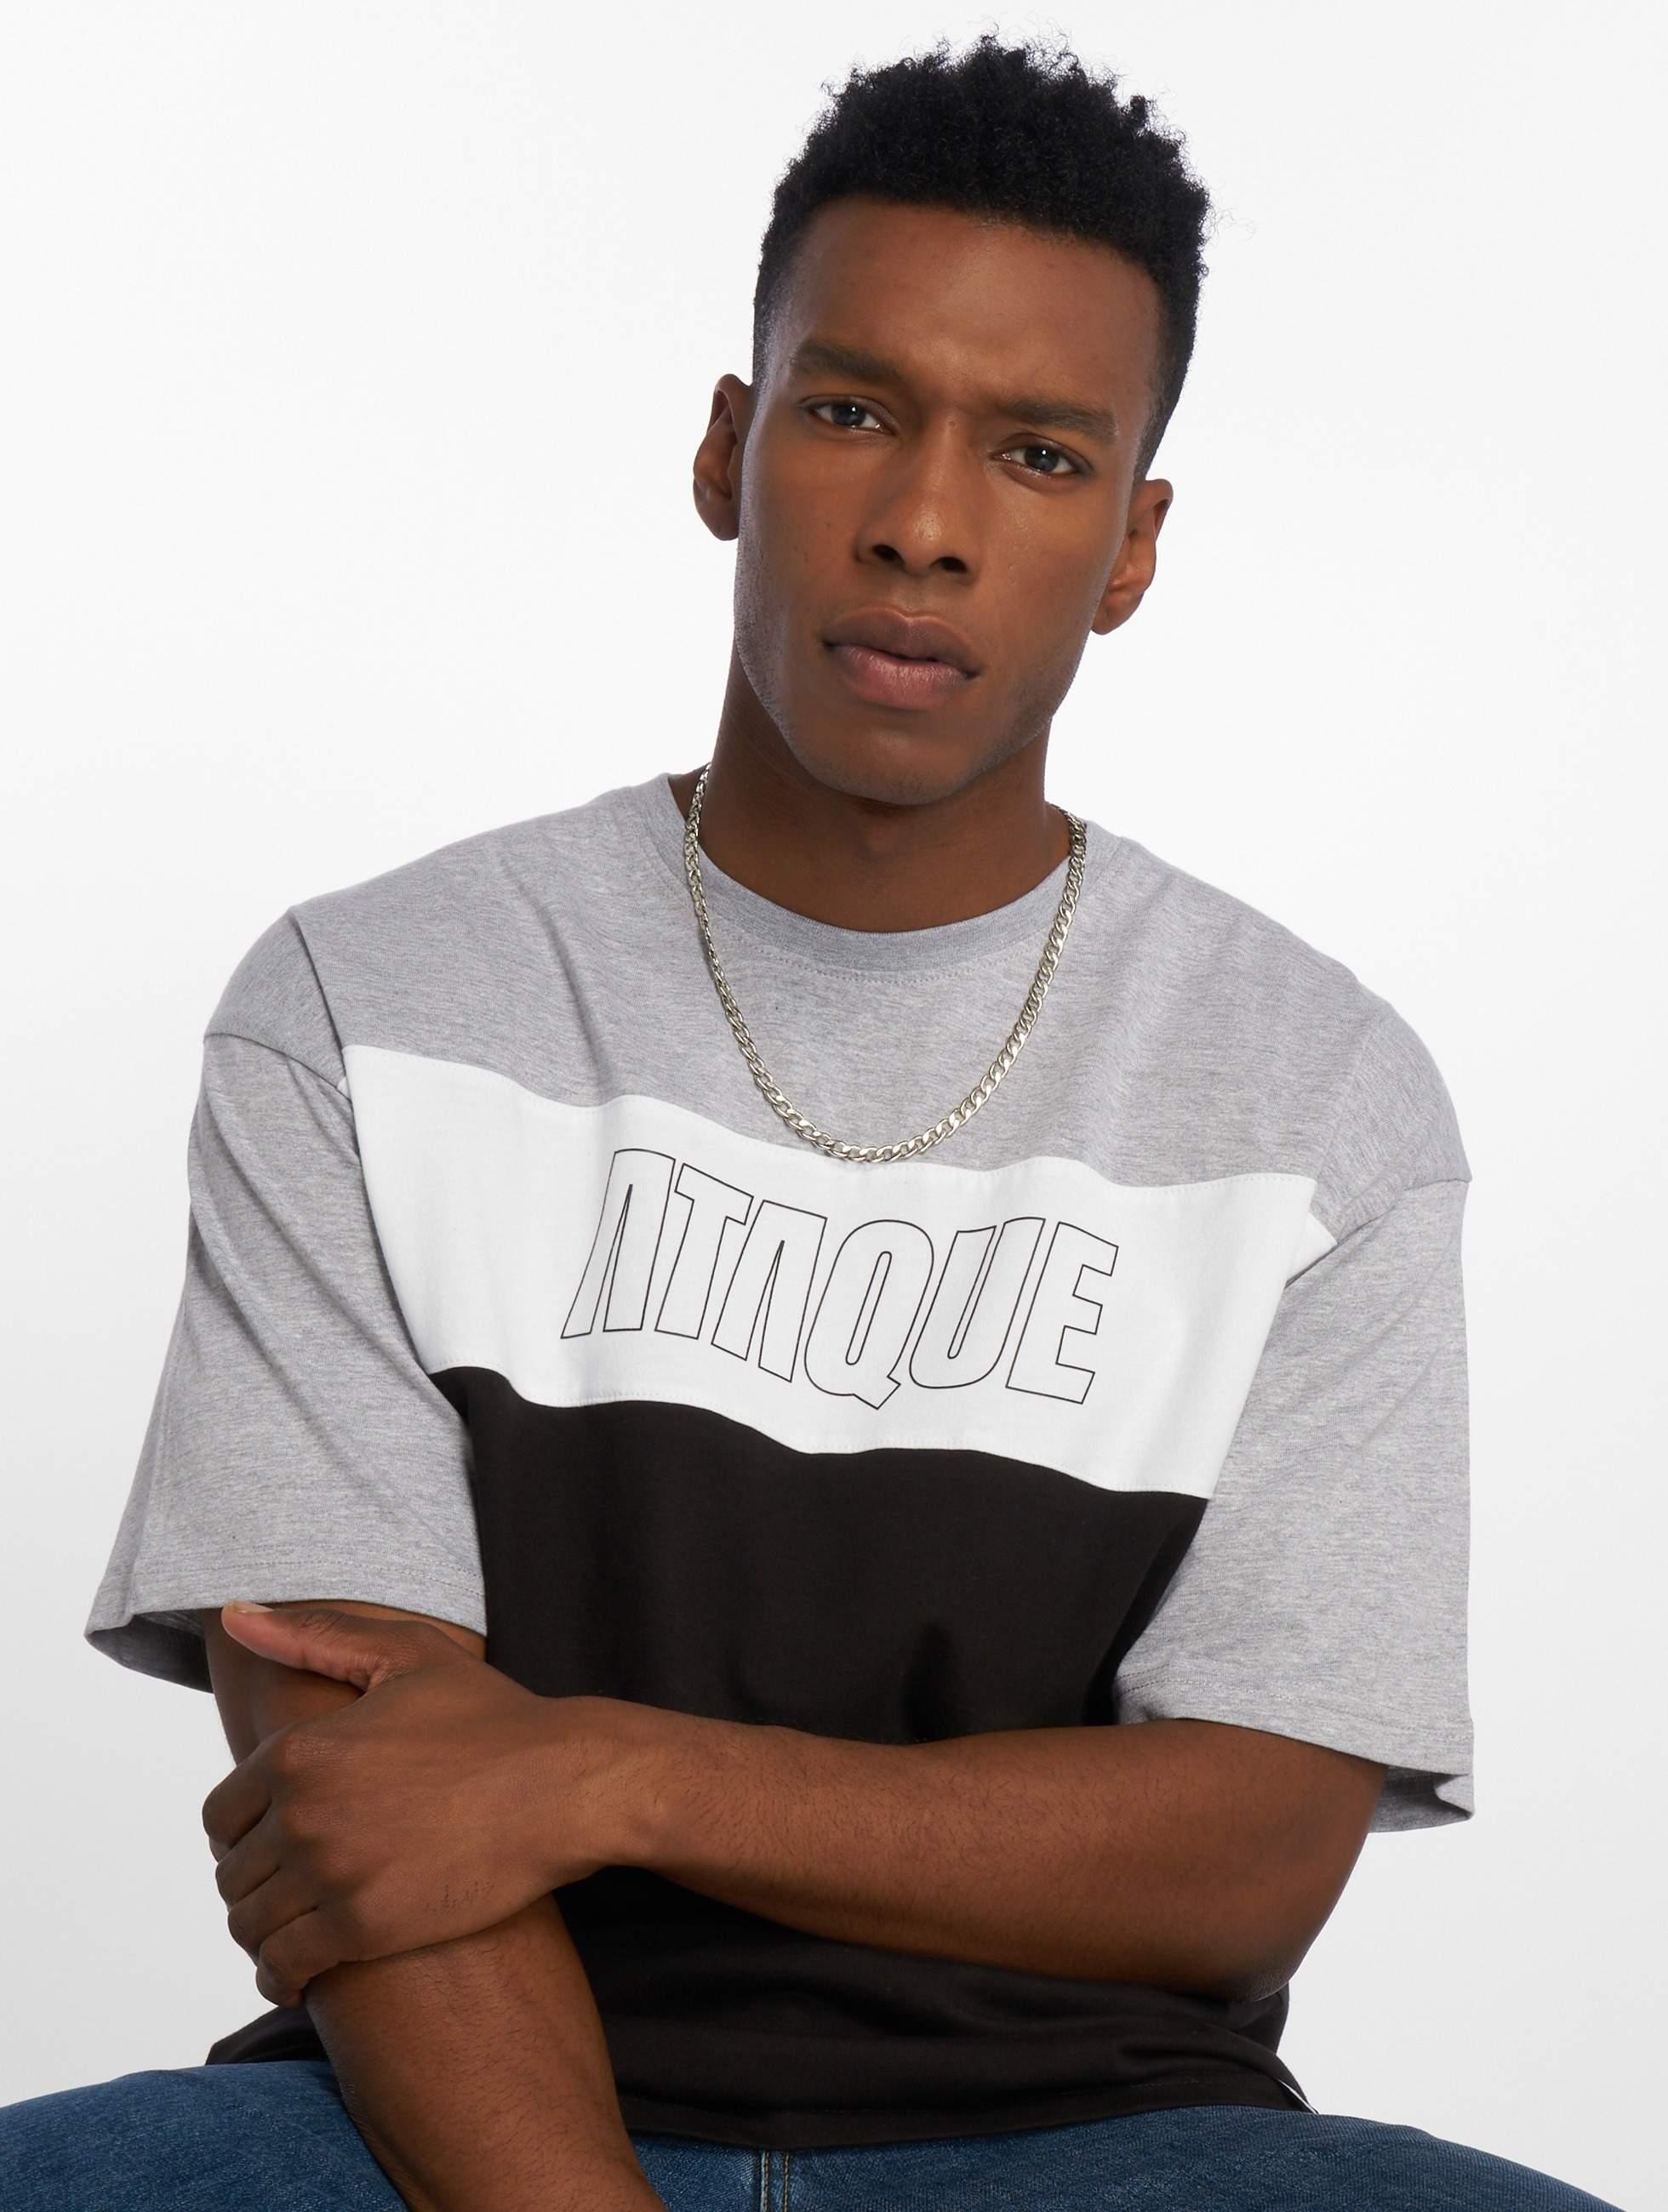 Ataque / T-Shirt Venado in black XL